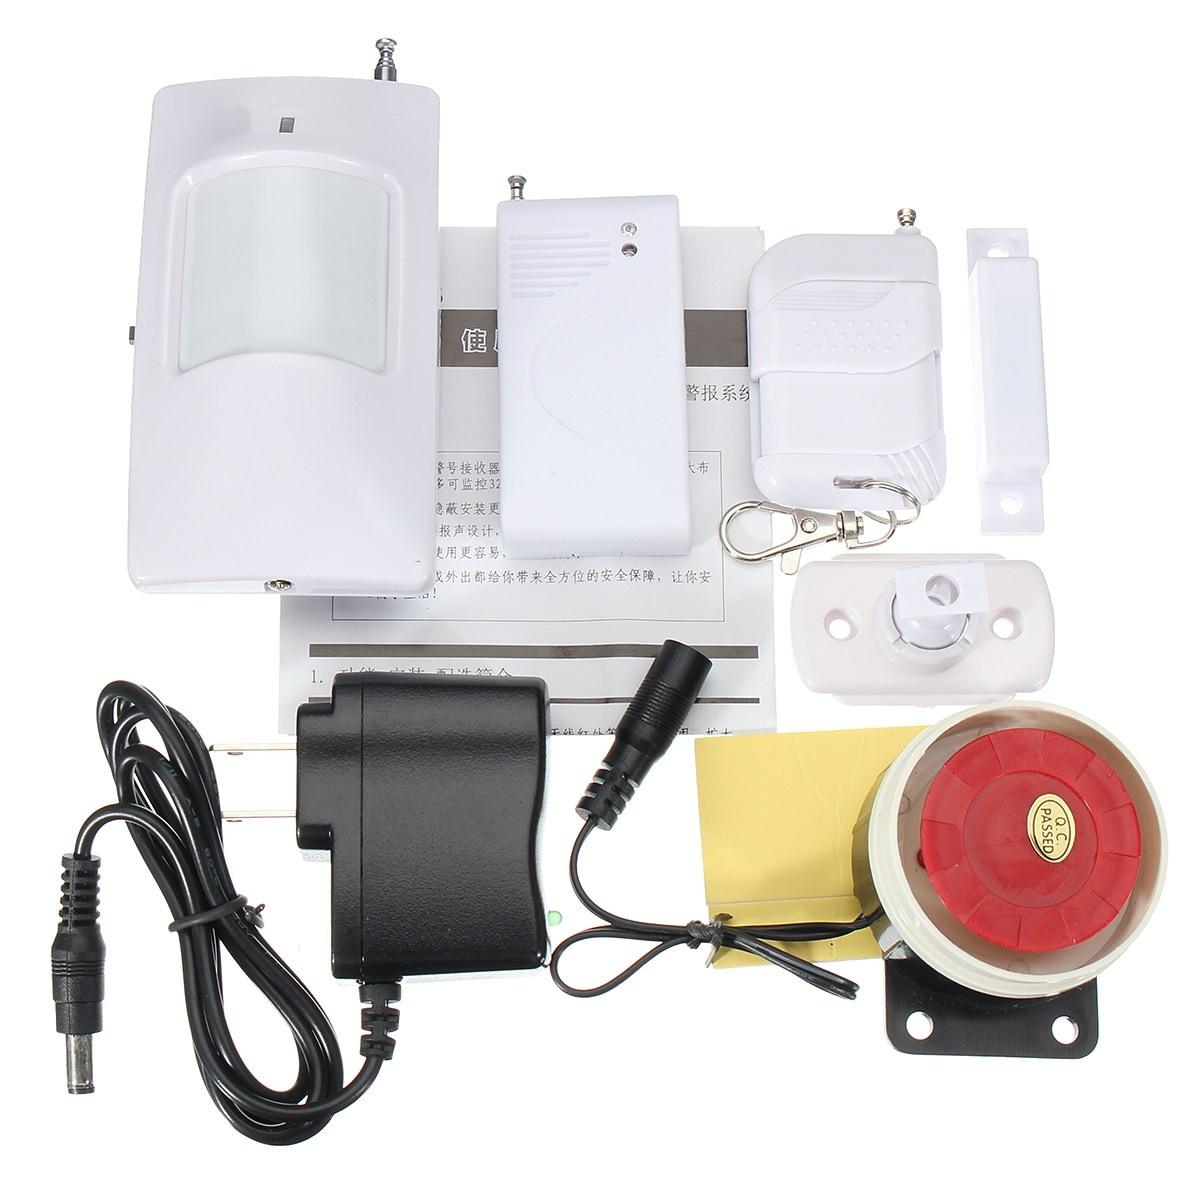 NEW Live Wireless Remote Control Siren PIR Motion Burglar Alarm System Home Security Safety Warning Protection security system alarm protection warning sticker